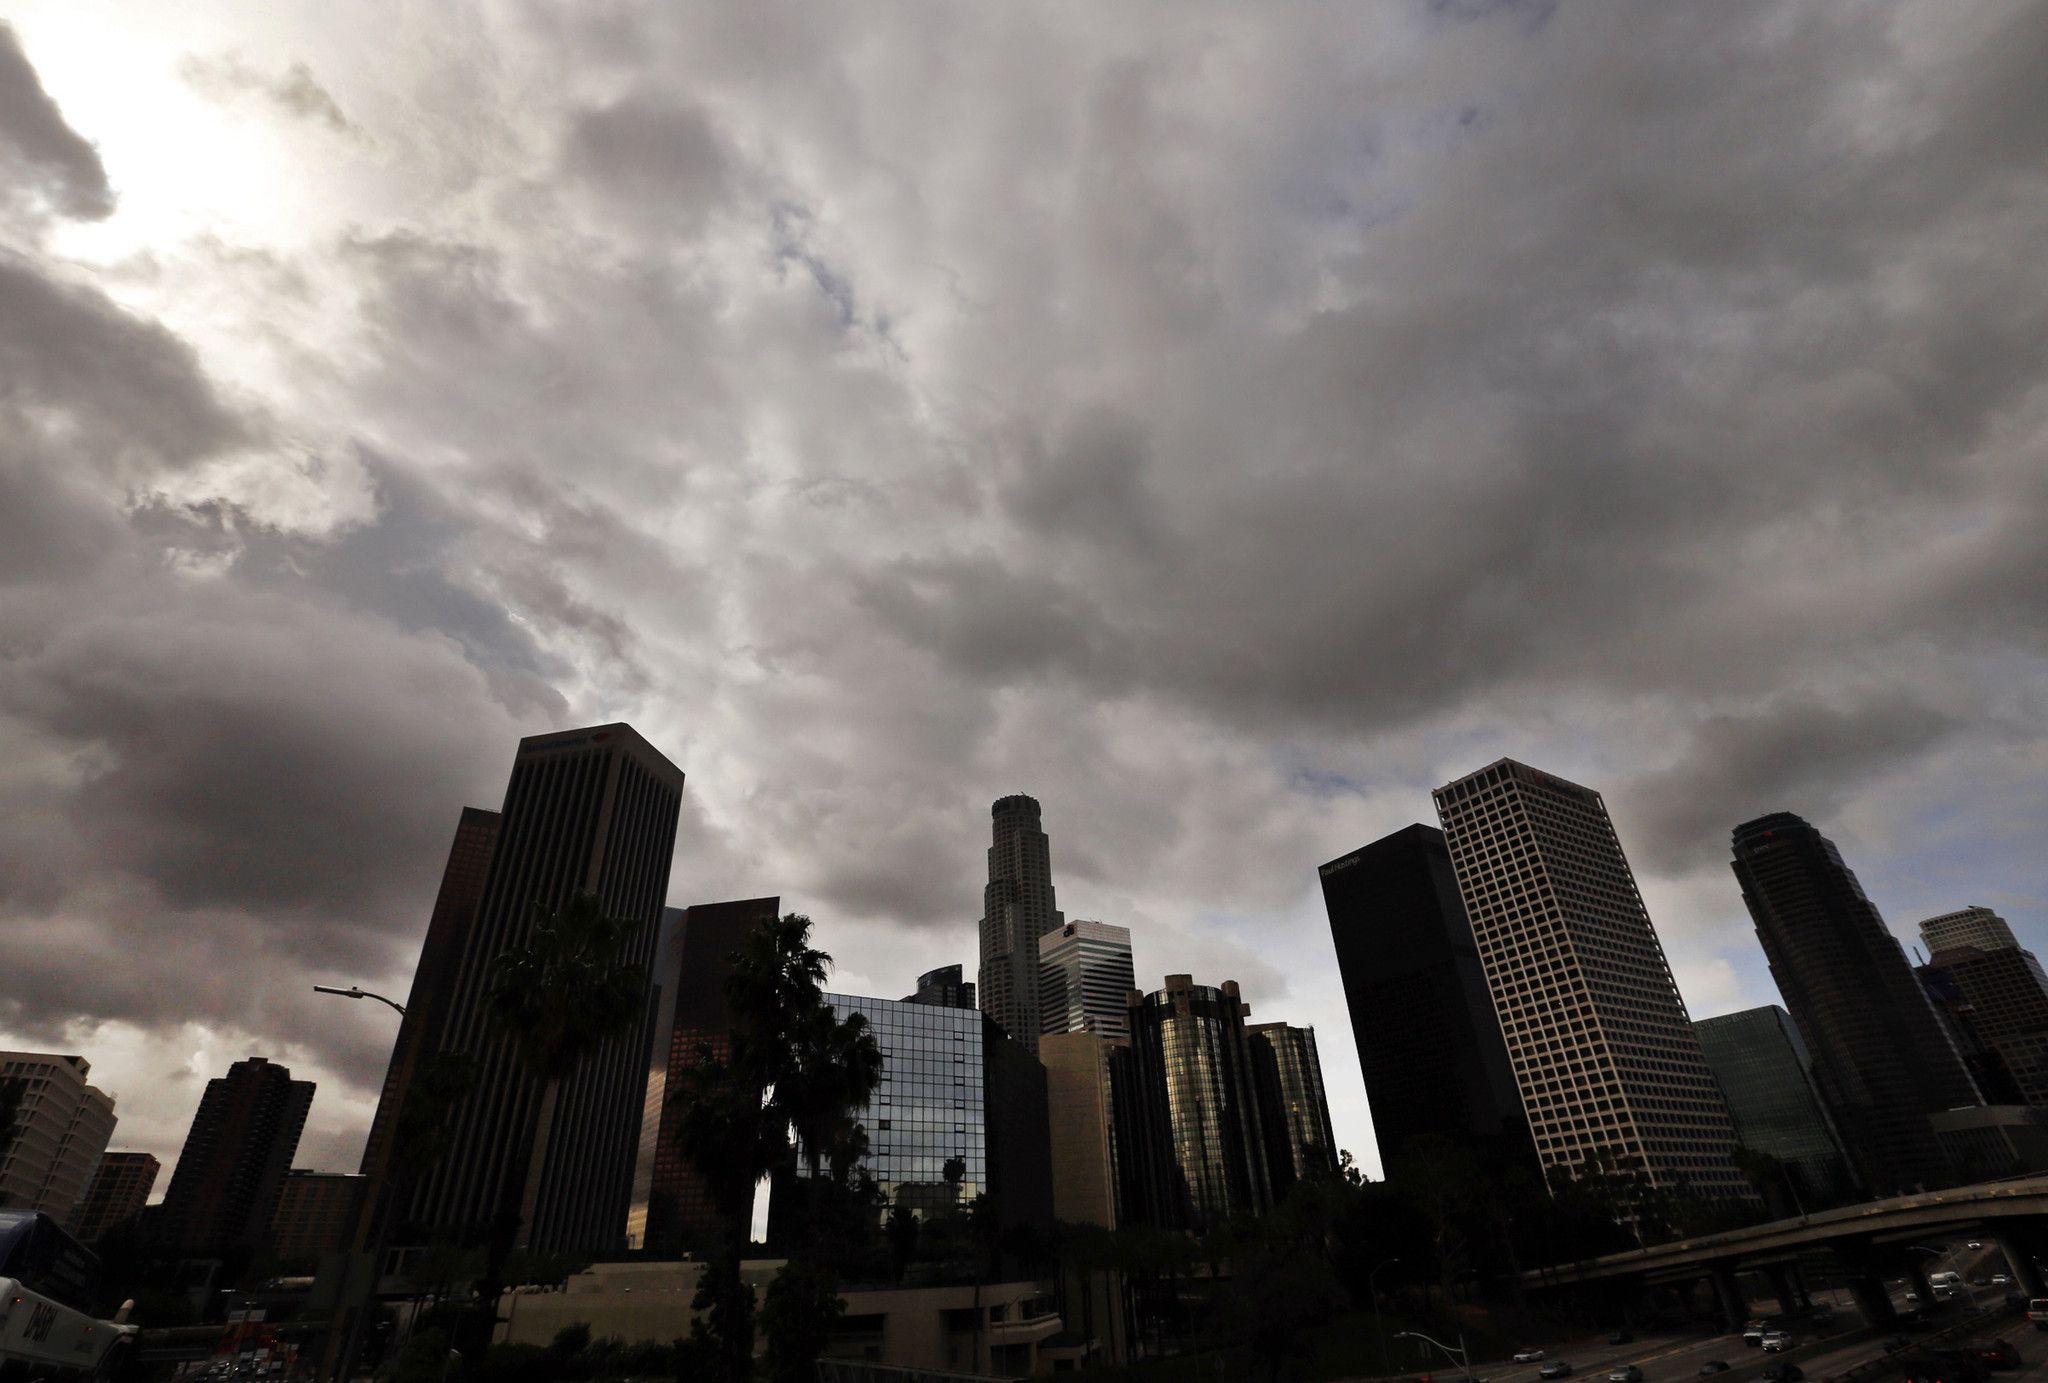 miracle may rain thunderstorms forecast through saturday